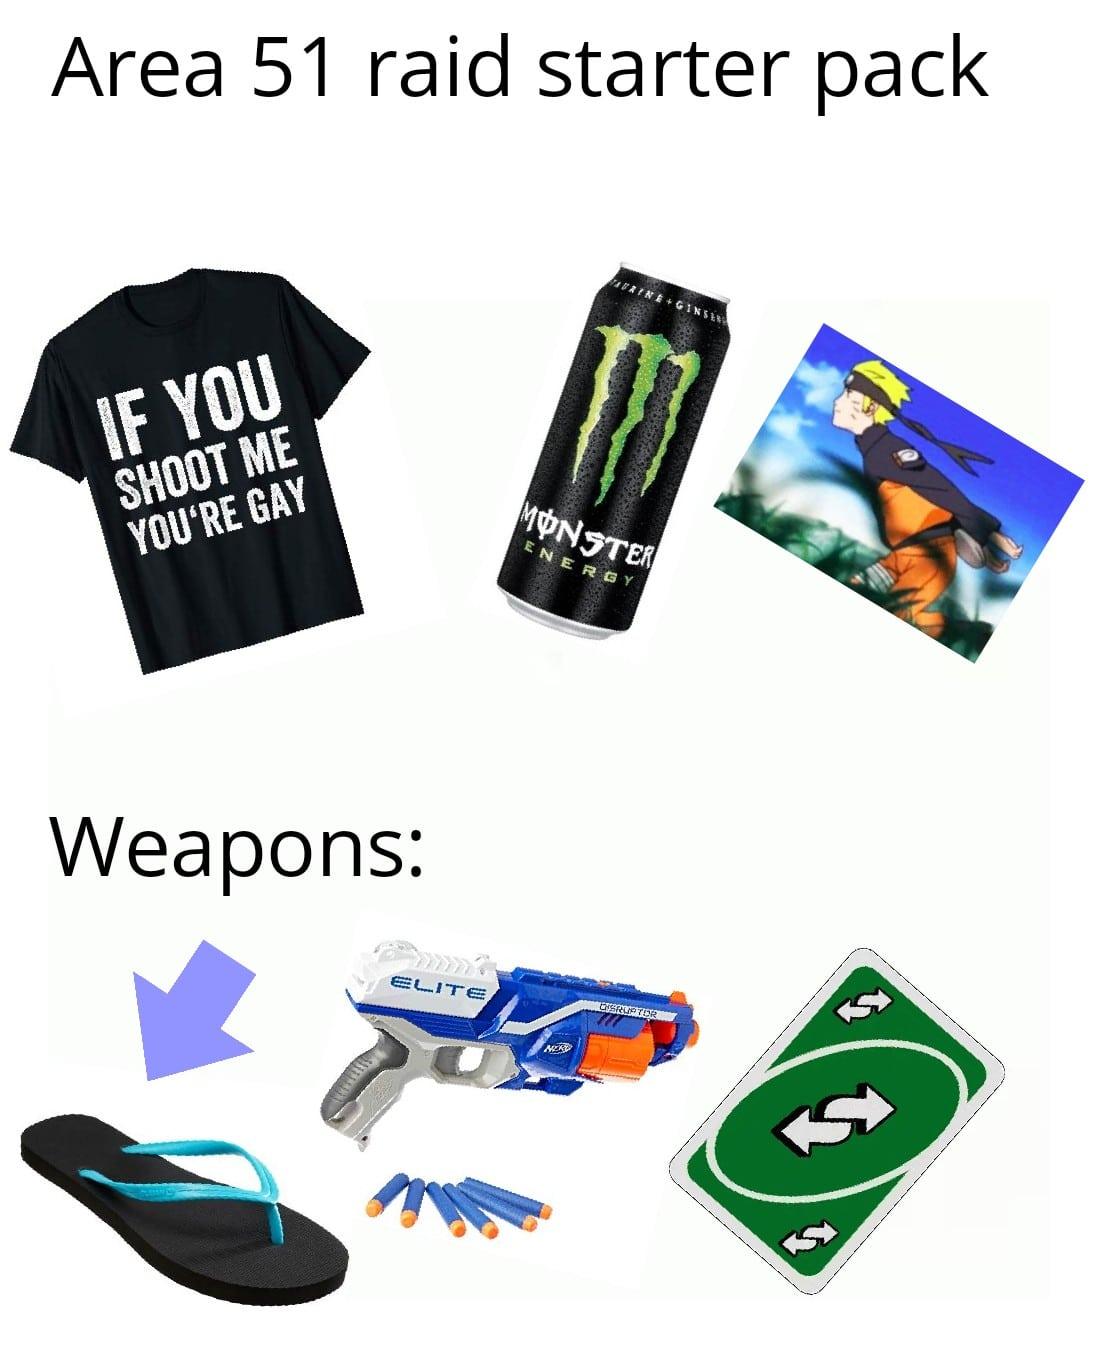 Dank Meme dank-memes cute text: Area 51 raid starter pack Weapons: